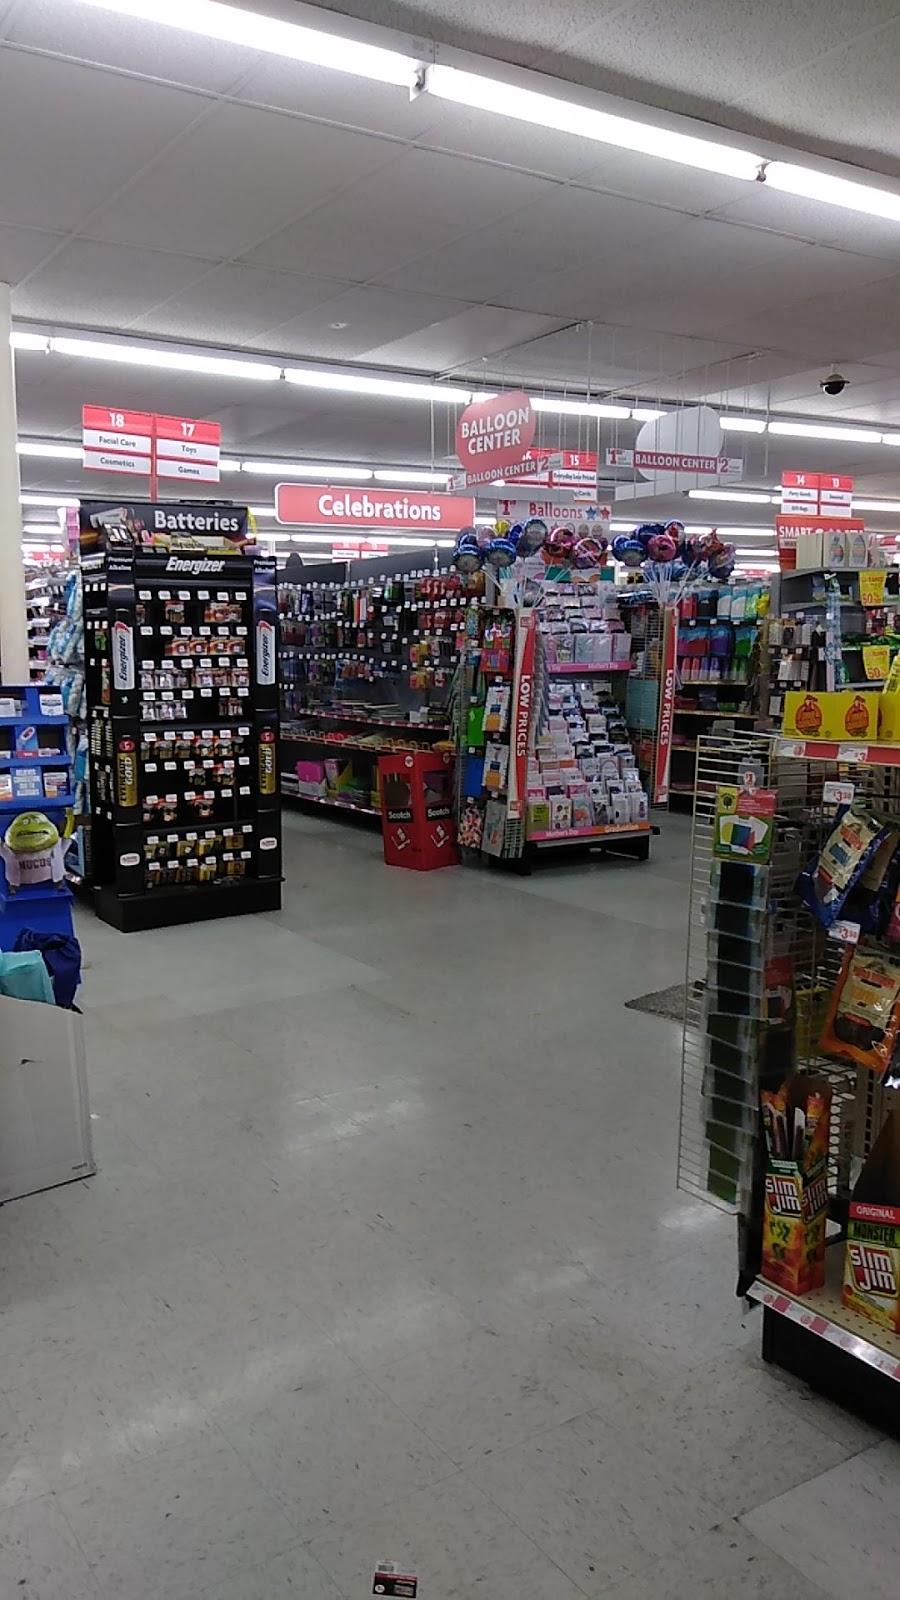 Family Dollar - clothing store  | Photo 2 of 6 | Address: 2930 E Northern Ave, Kingman, AZ 86409, USA | Phone: (928) 681-3251